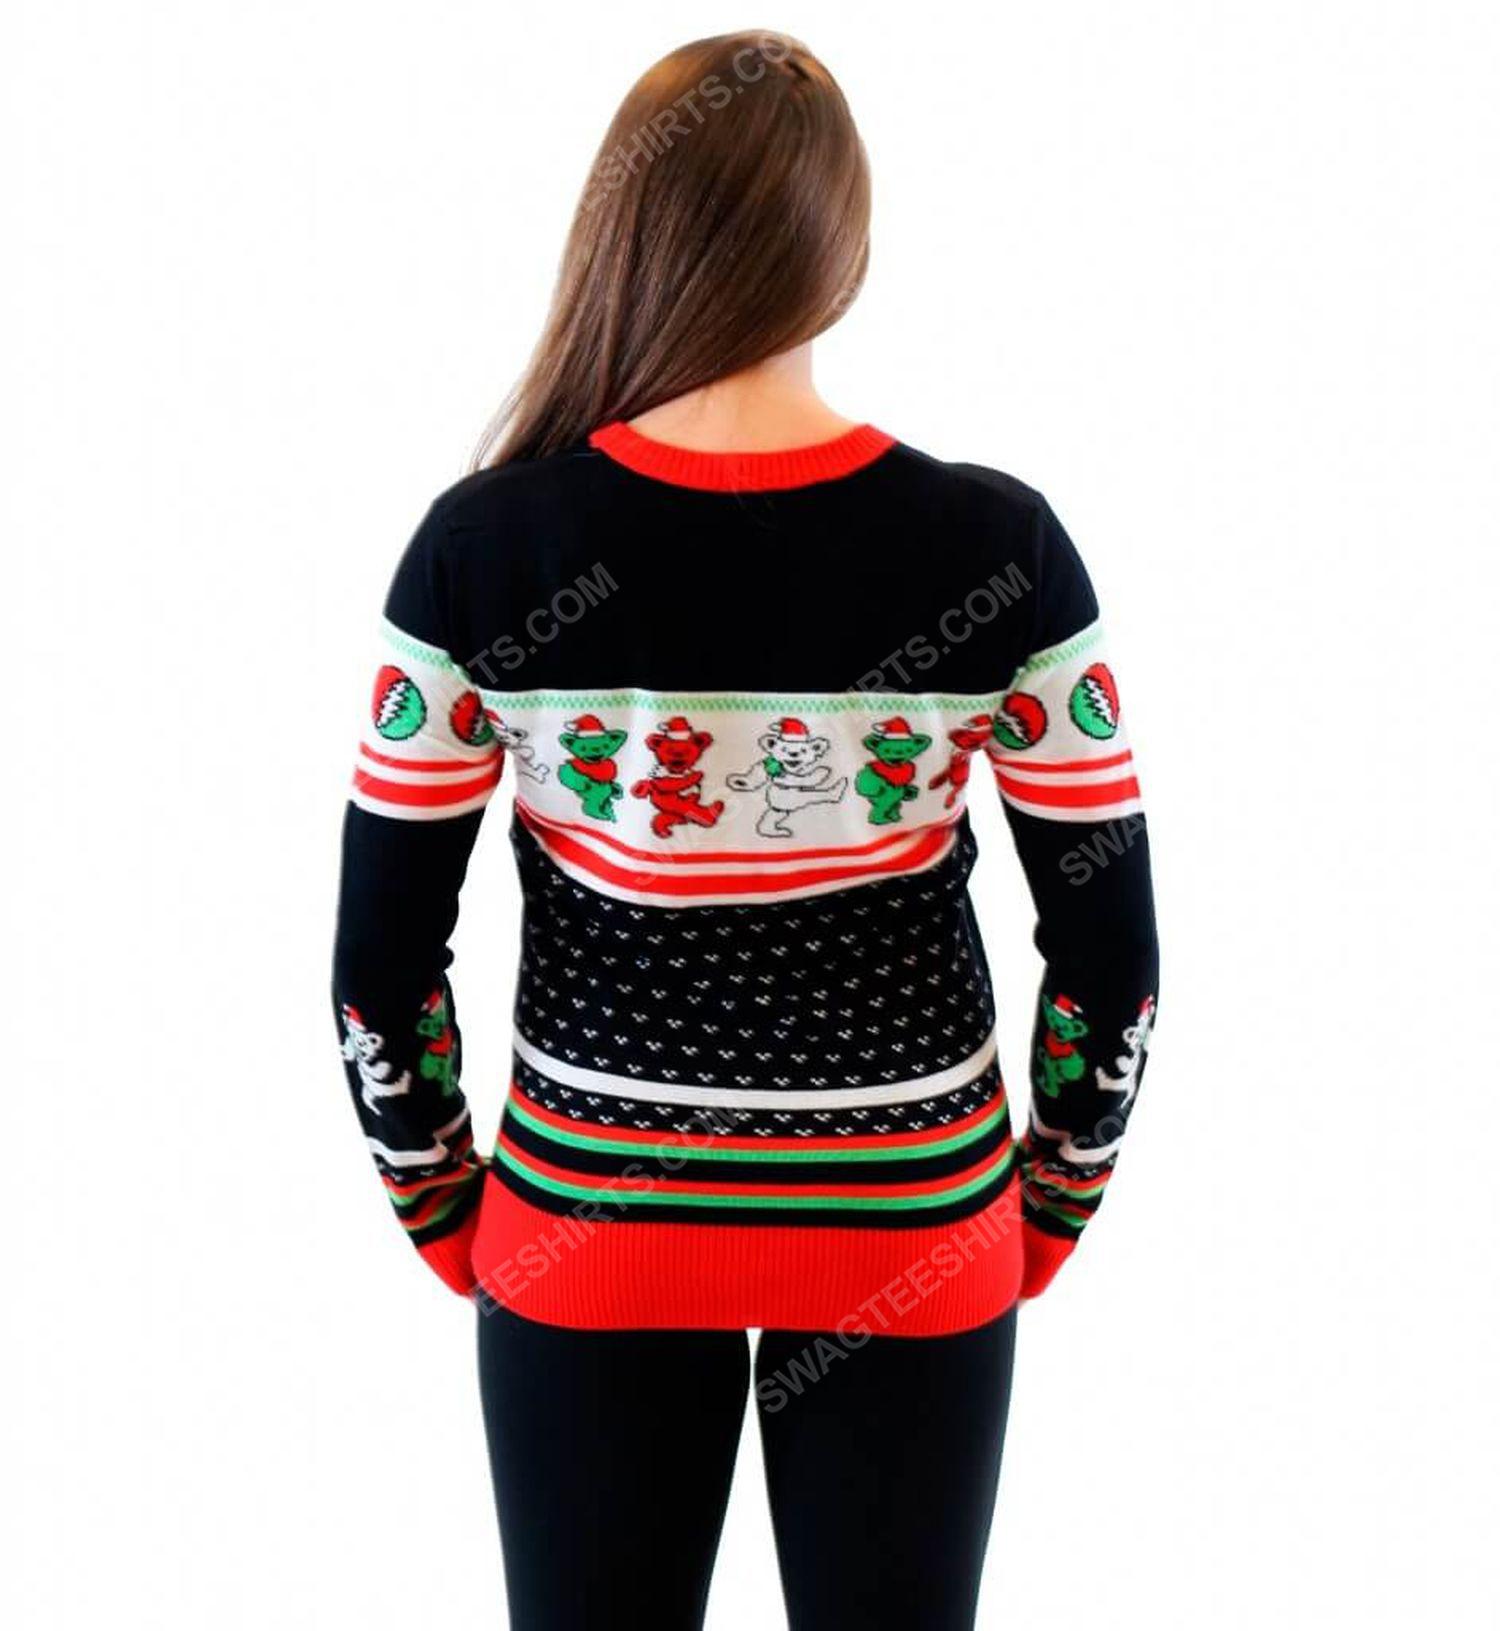 Grateful dead dancing bears full print ugly christmas sweater 3 - Copy